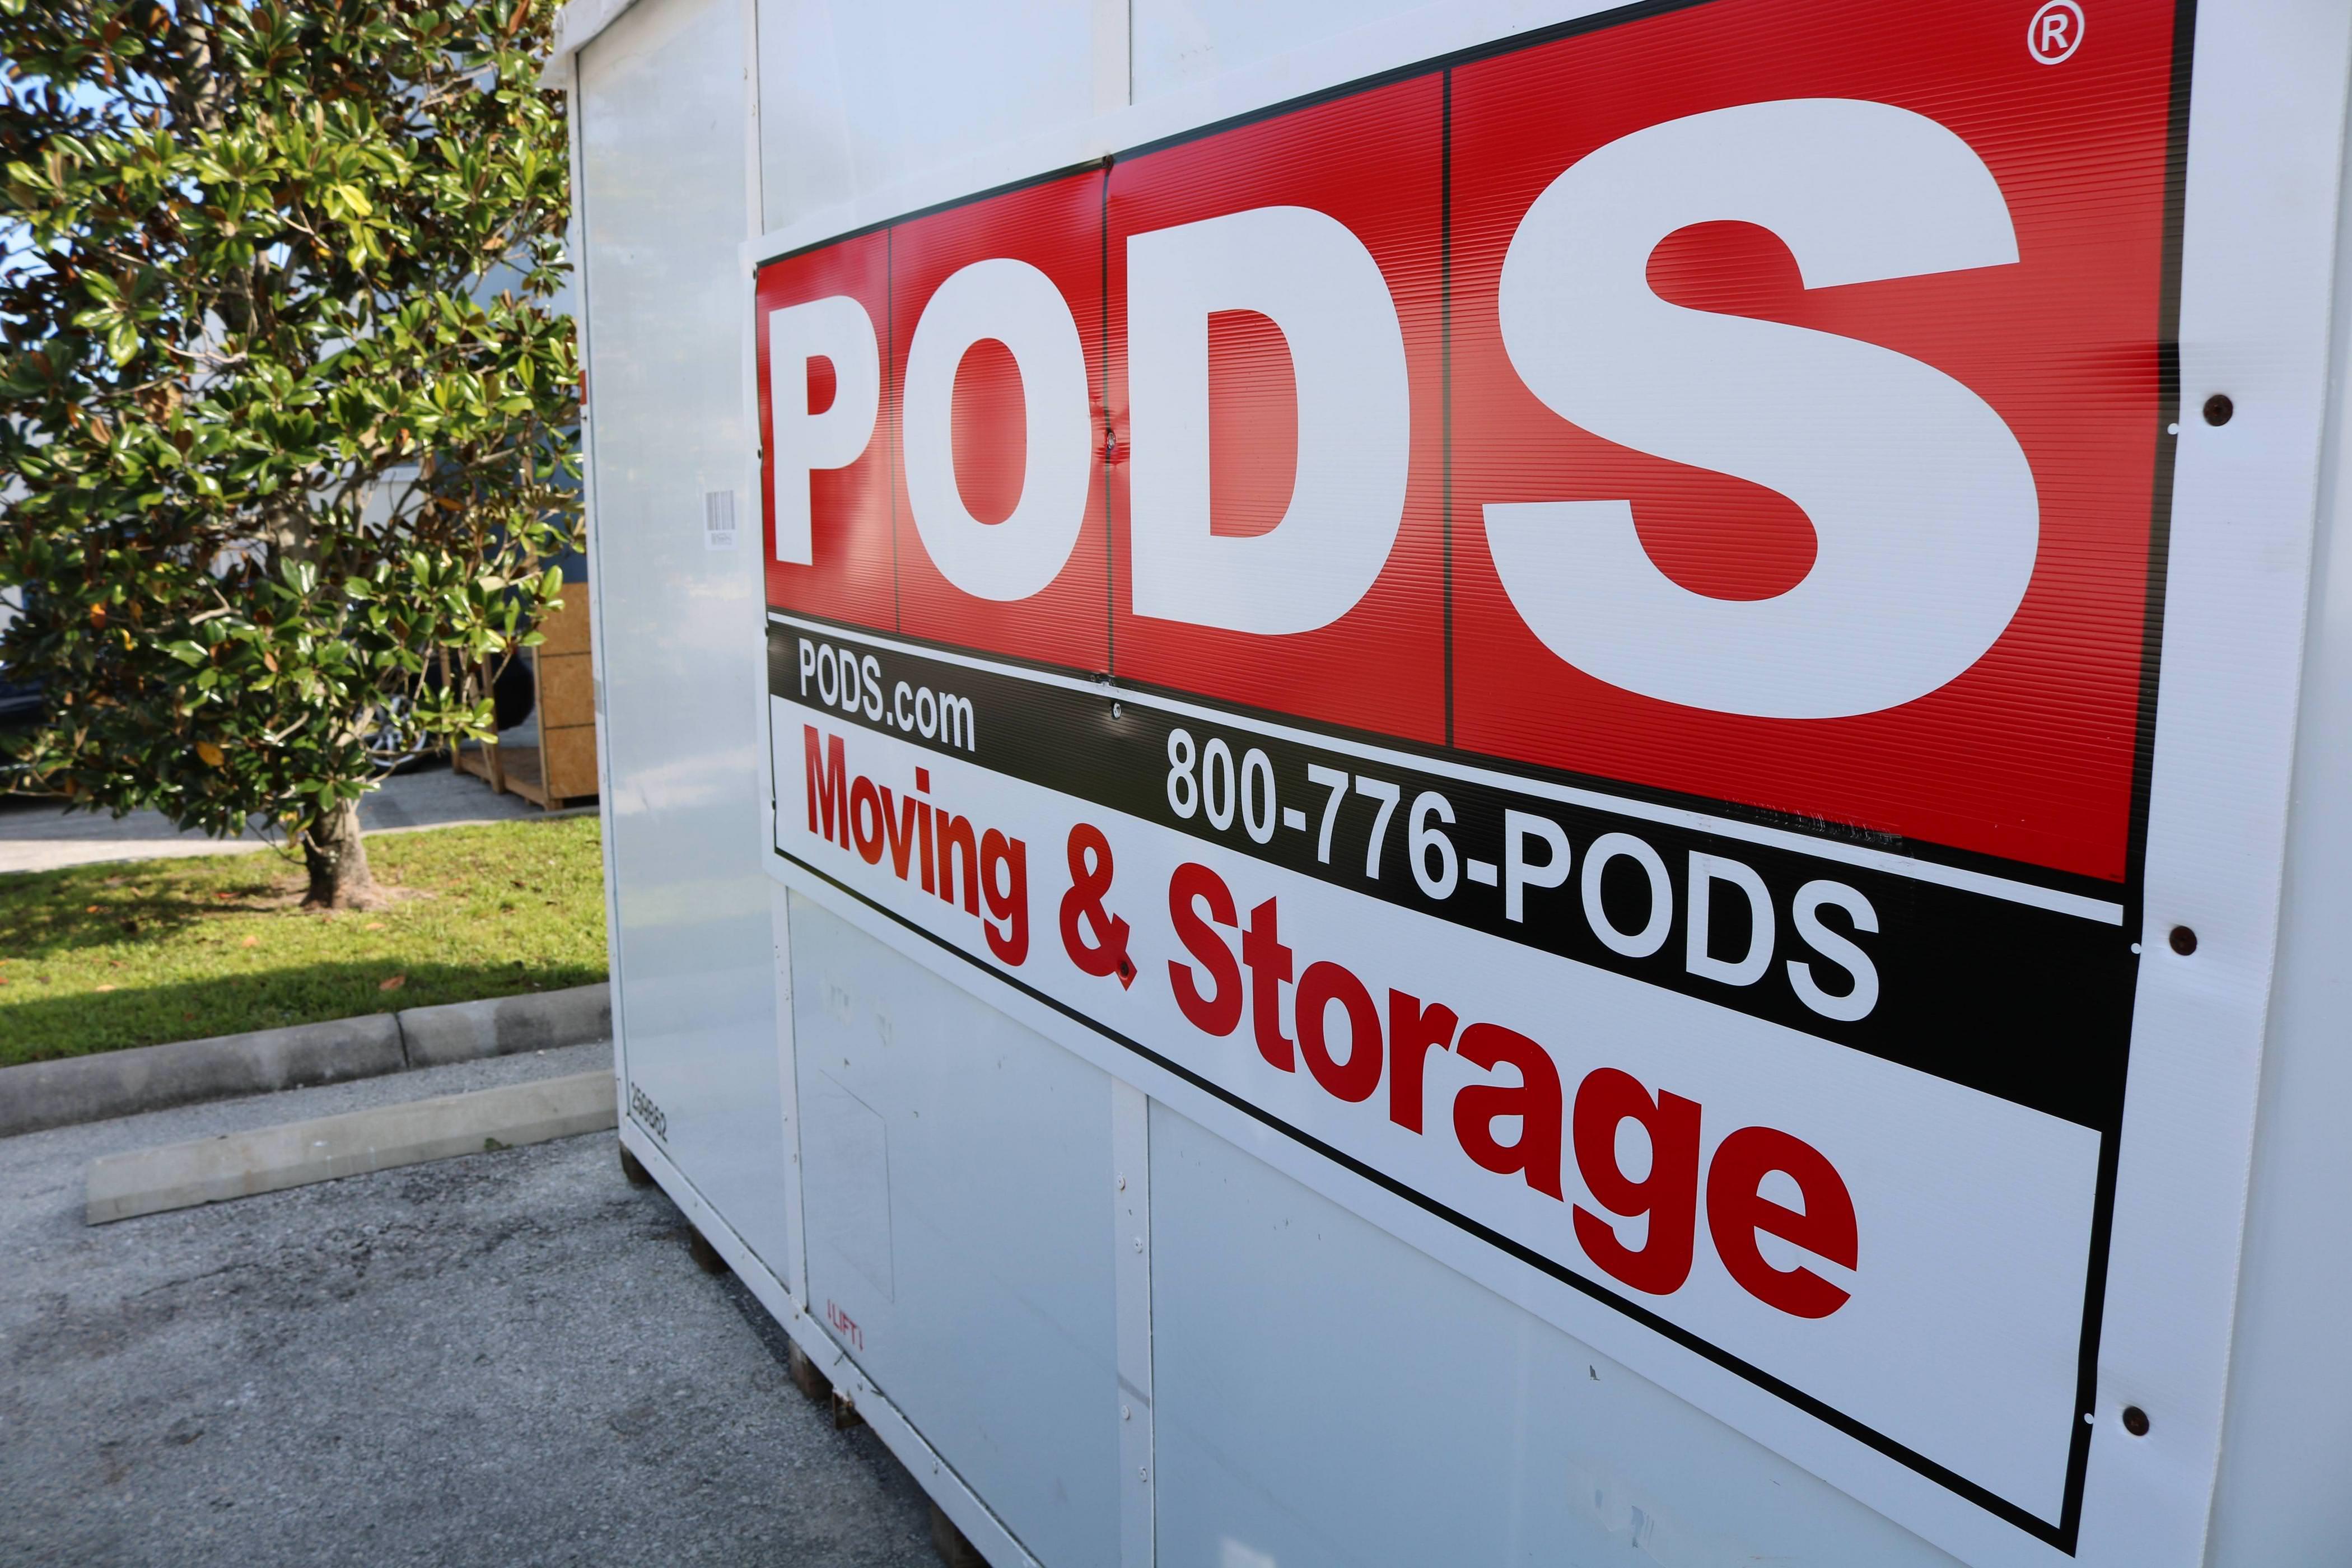 PODS - Eugene, OR